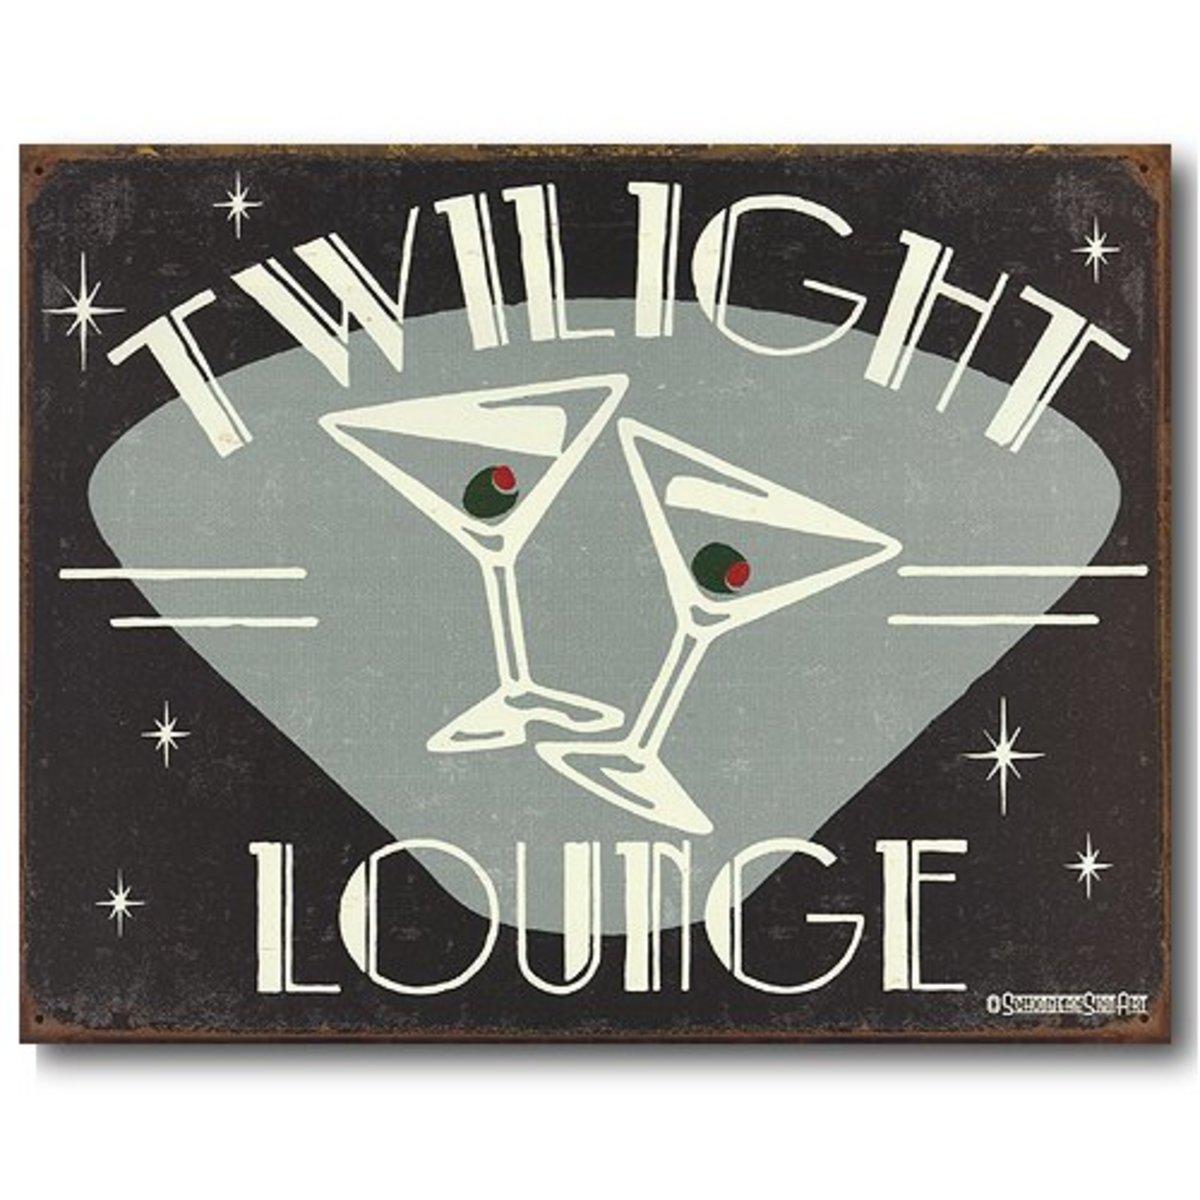 Twilight Lounge Martini Sign